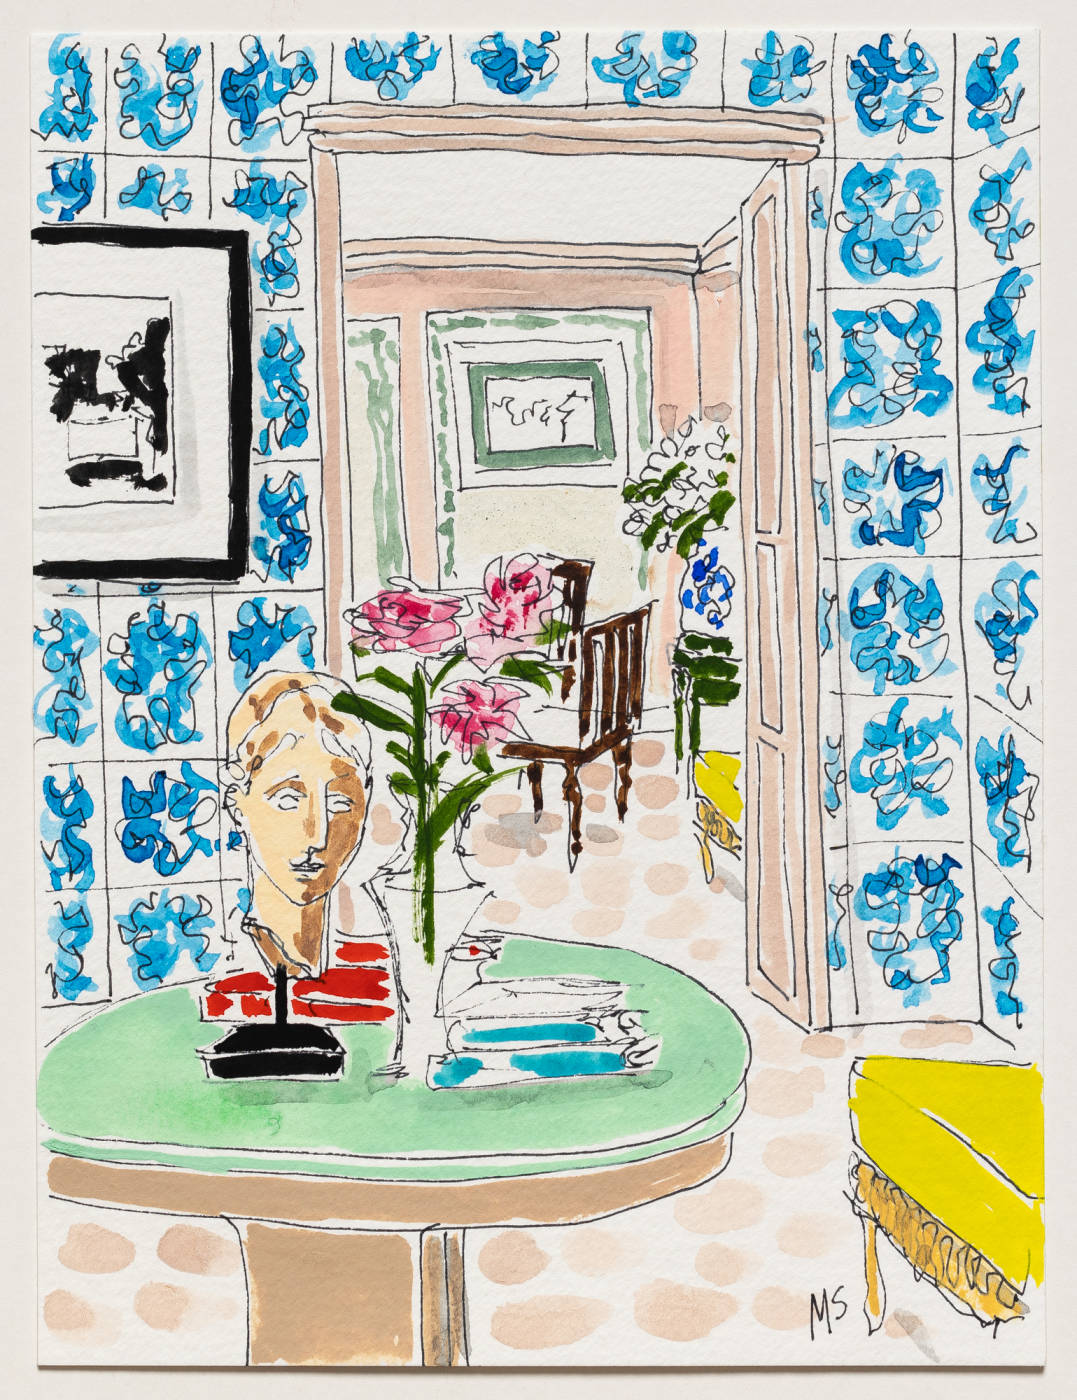 A Room by Studio Peregalli